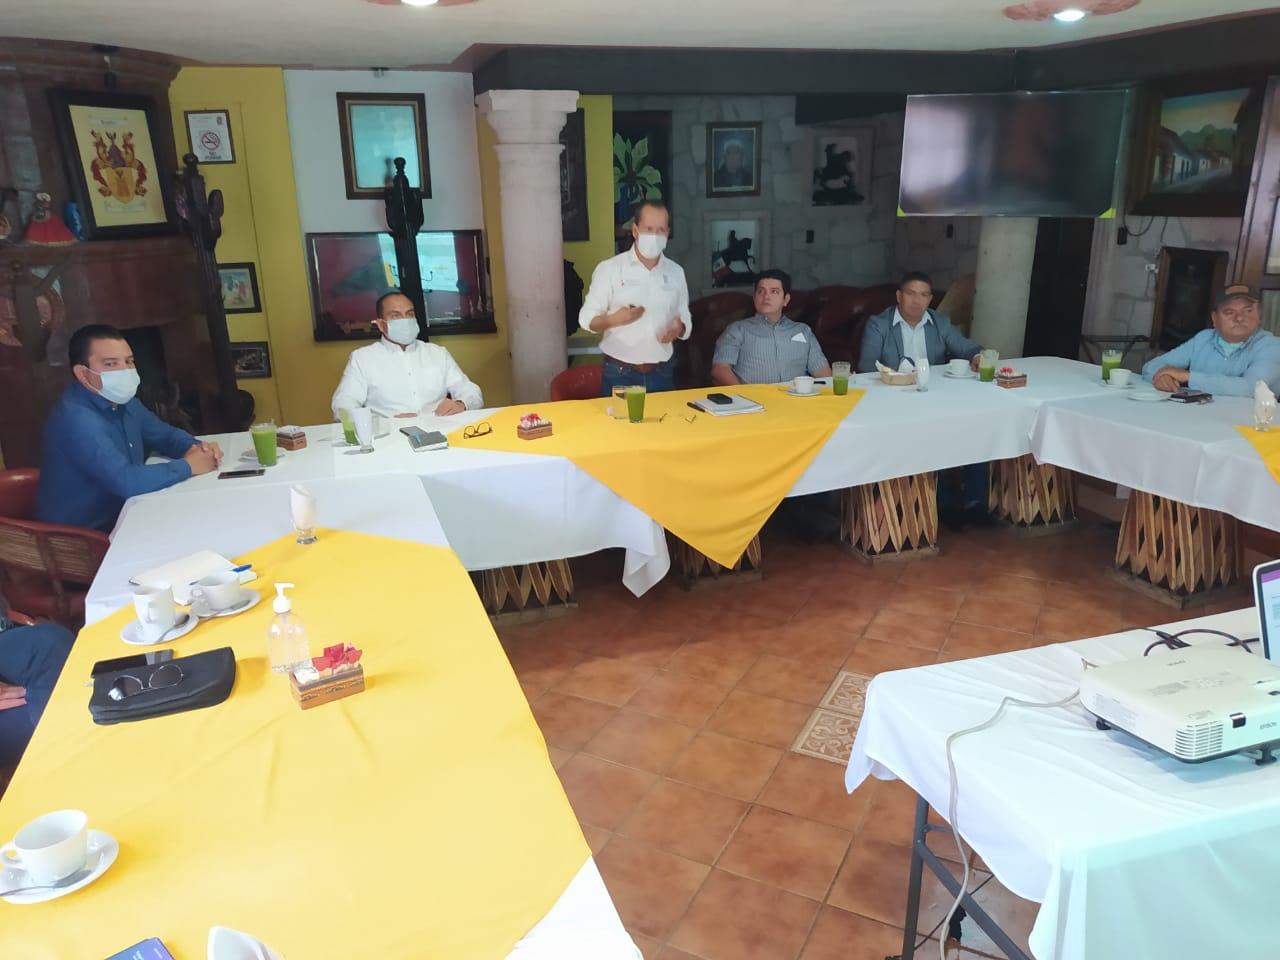 Plantea Michoacán a diputados, gestión conjunta para comercialización justa de maíz